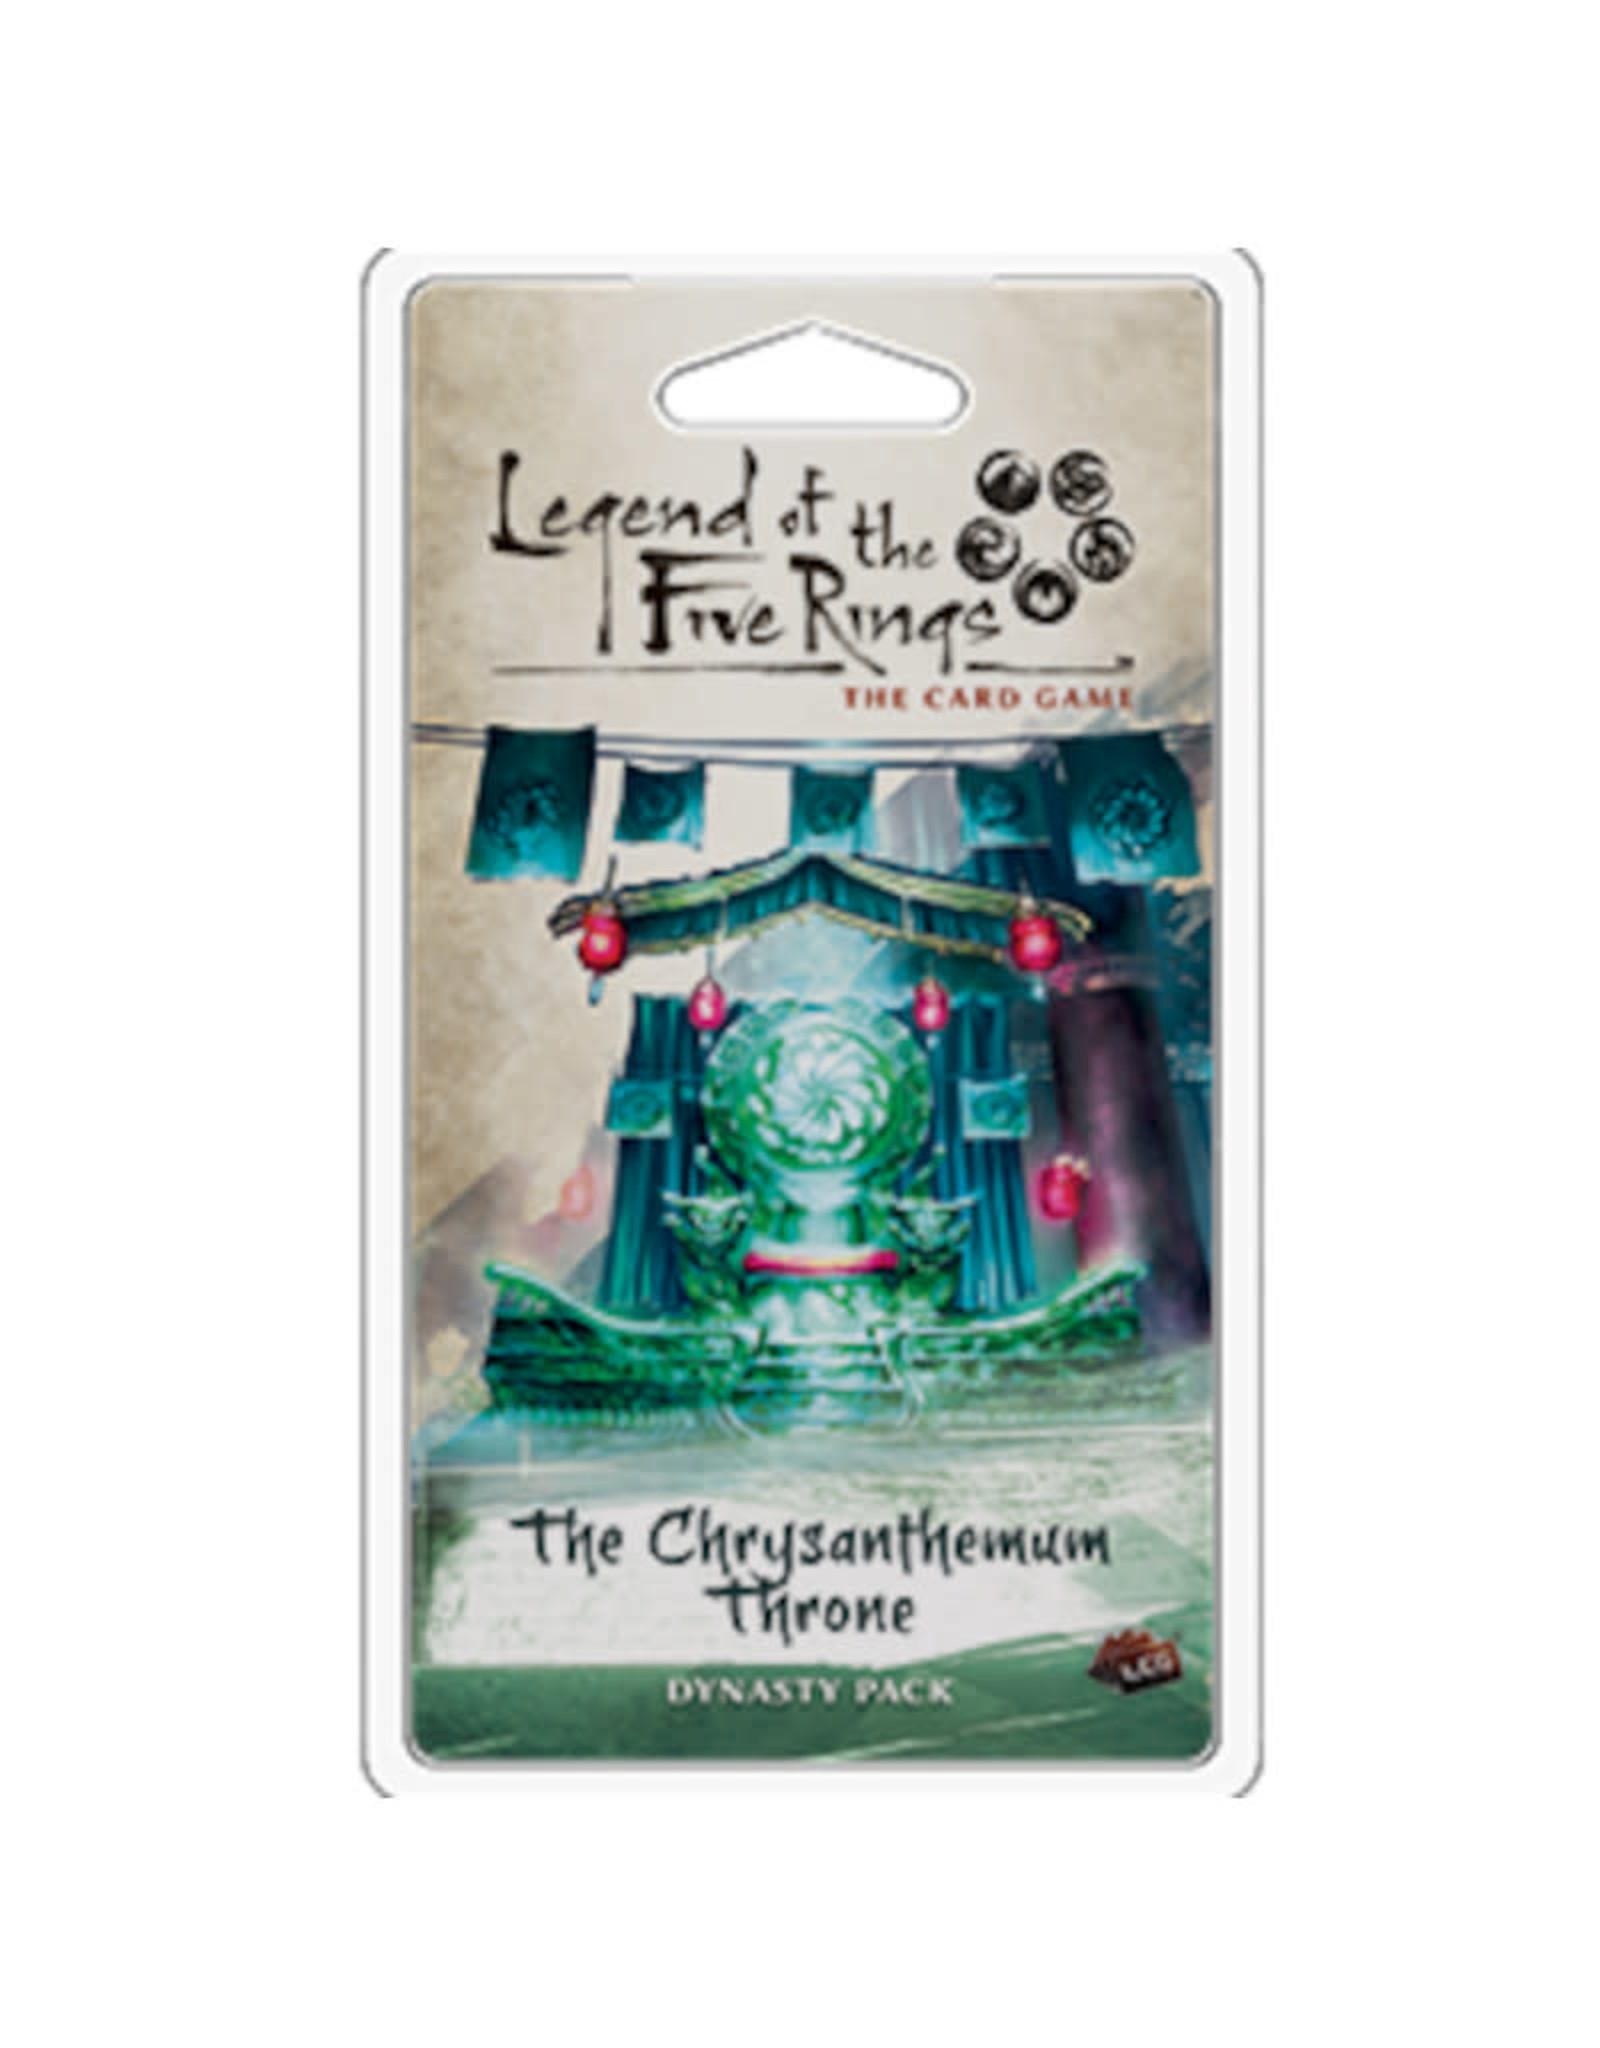 Fantasy Flight Games Legend of the Five Rings LCG Chrysanthemum Throne